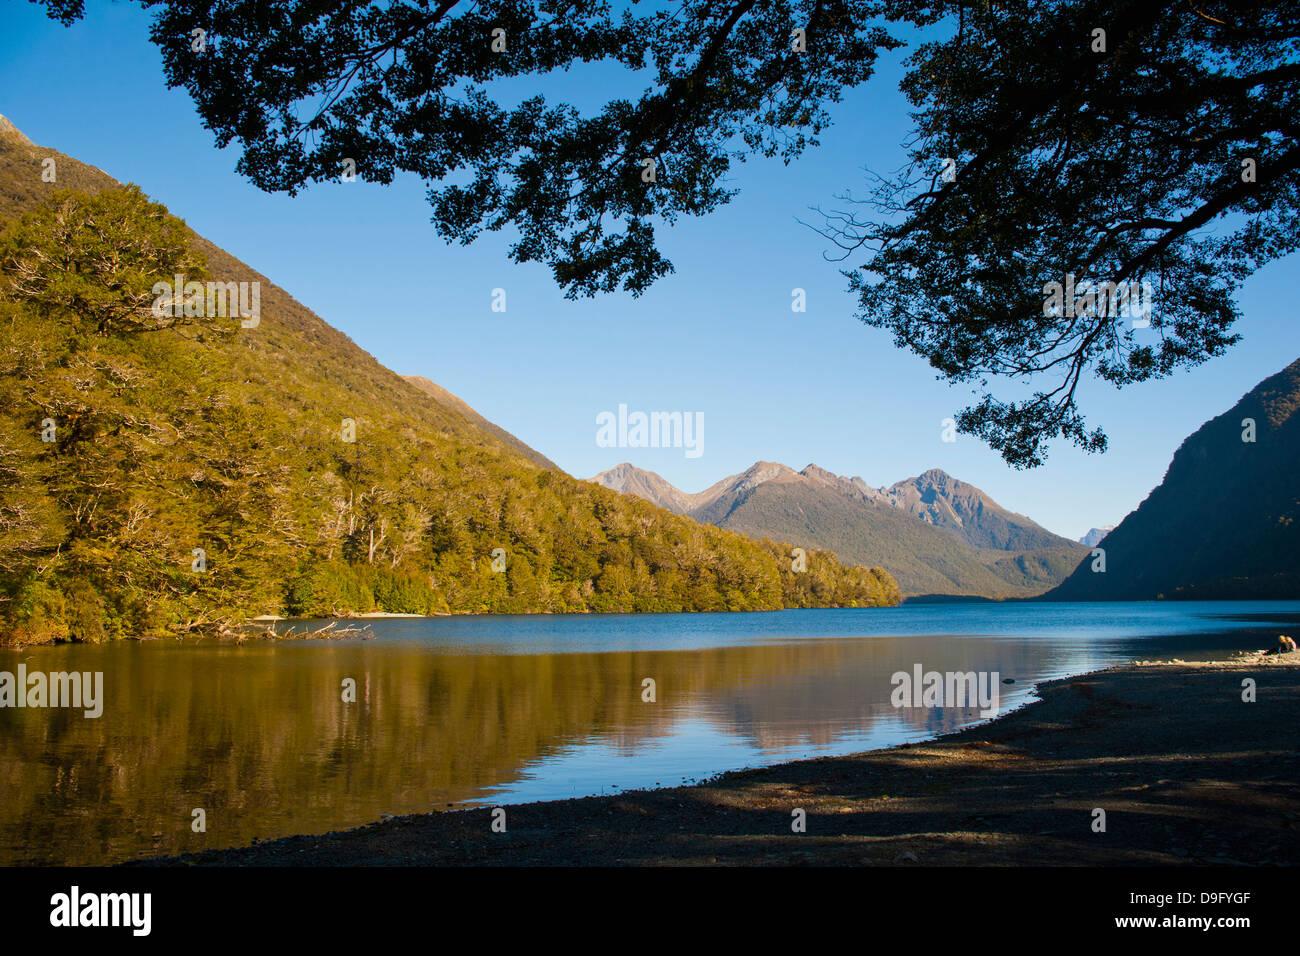 Lake Gunn mountain reflections, Fiordland National Park, UNESCO World Heritage Site, South Island, New Zealand - Stock Image